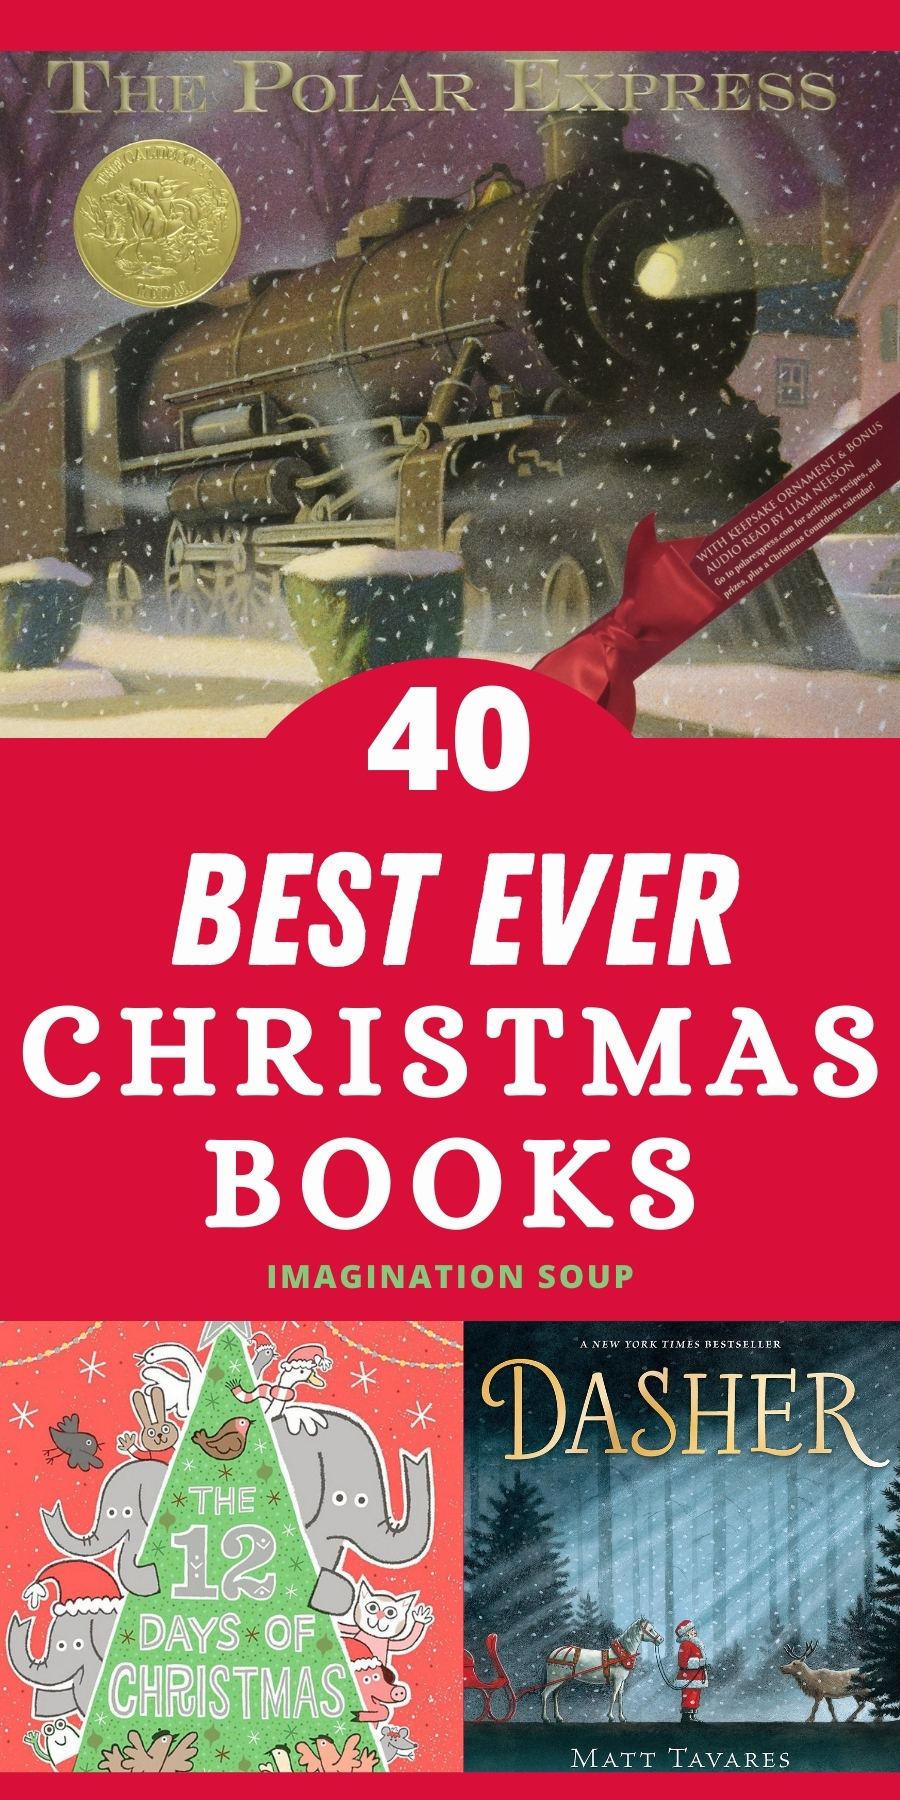 New York Times Best Books For Children 2020 Christmas Biggest, Best List of Children's Christmas Books in 2020